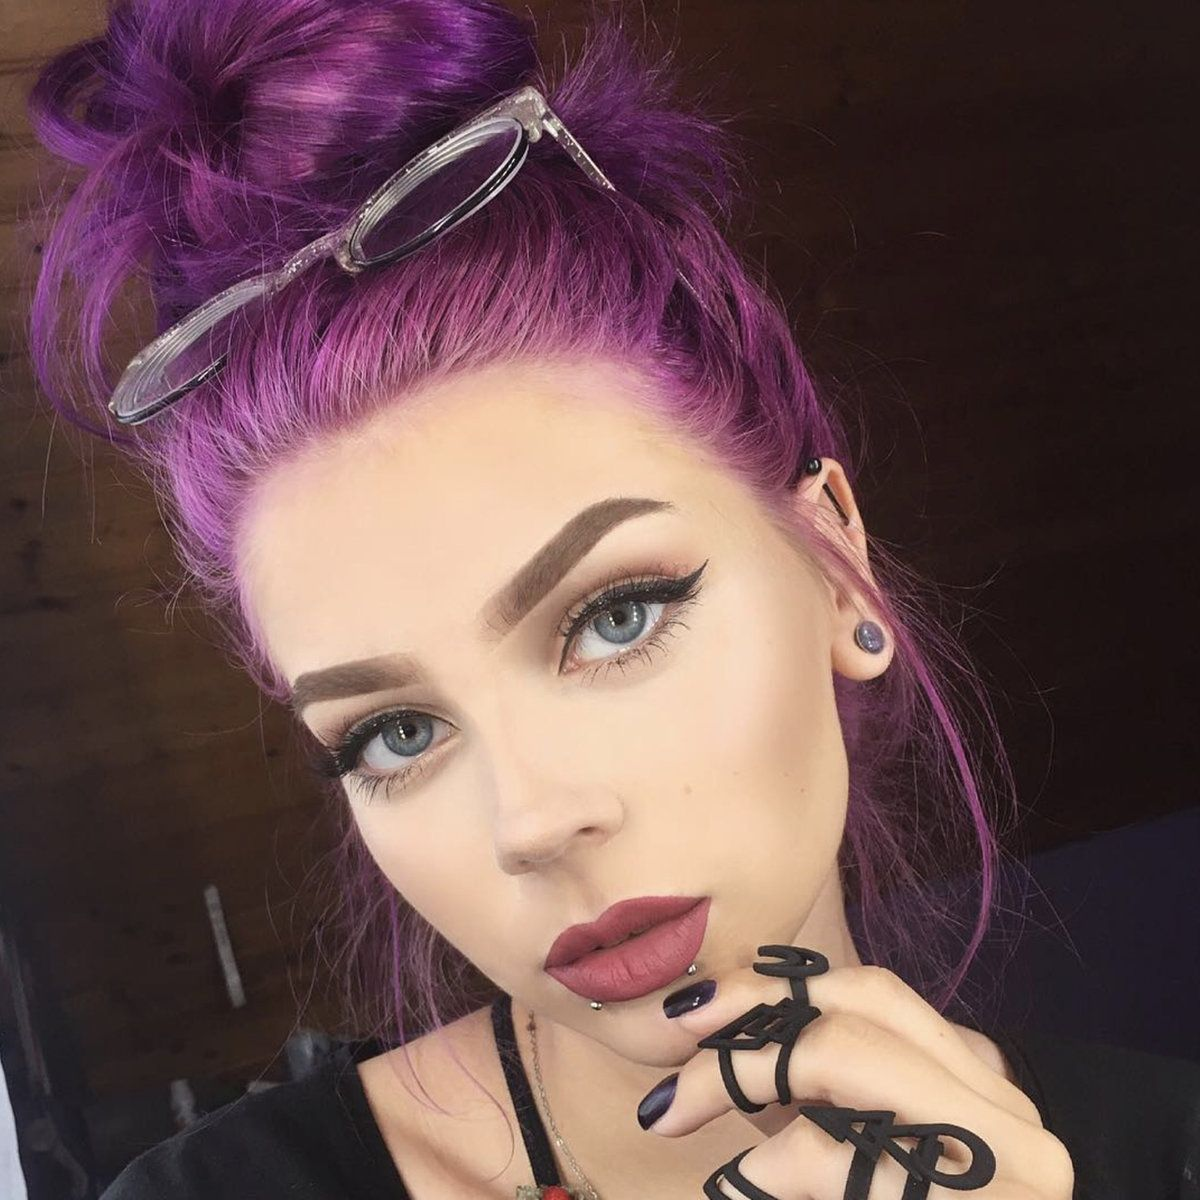 Pony Hair Color (Electric VioletPurple) Semi permanent